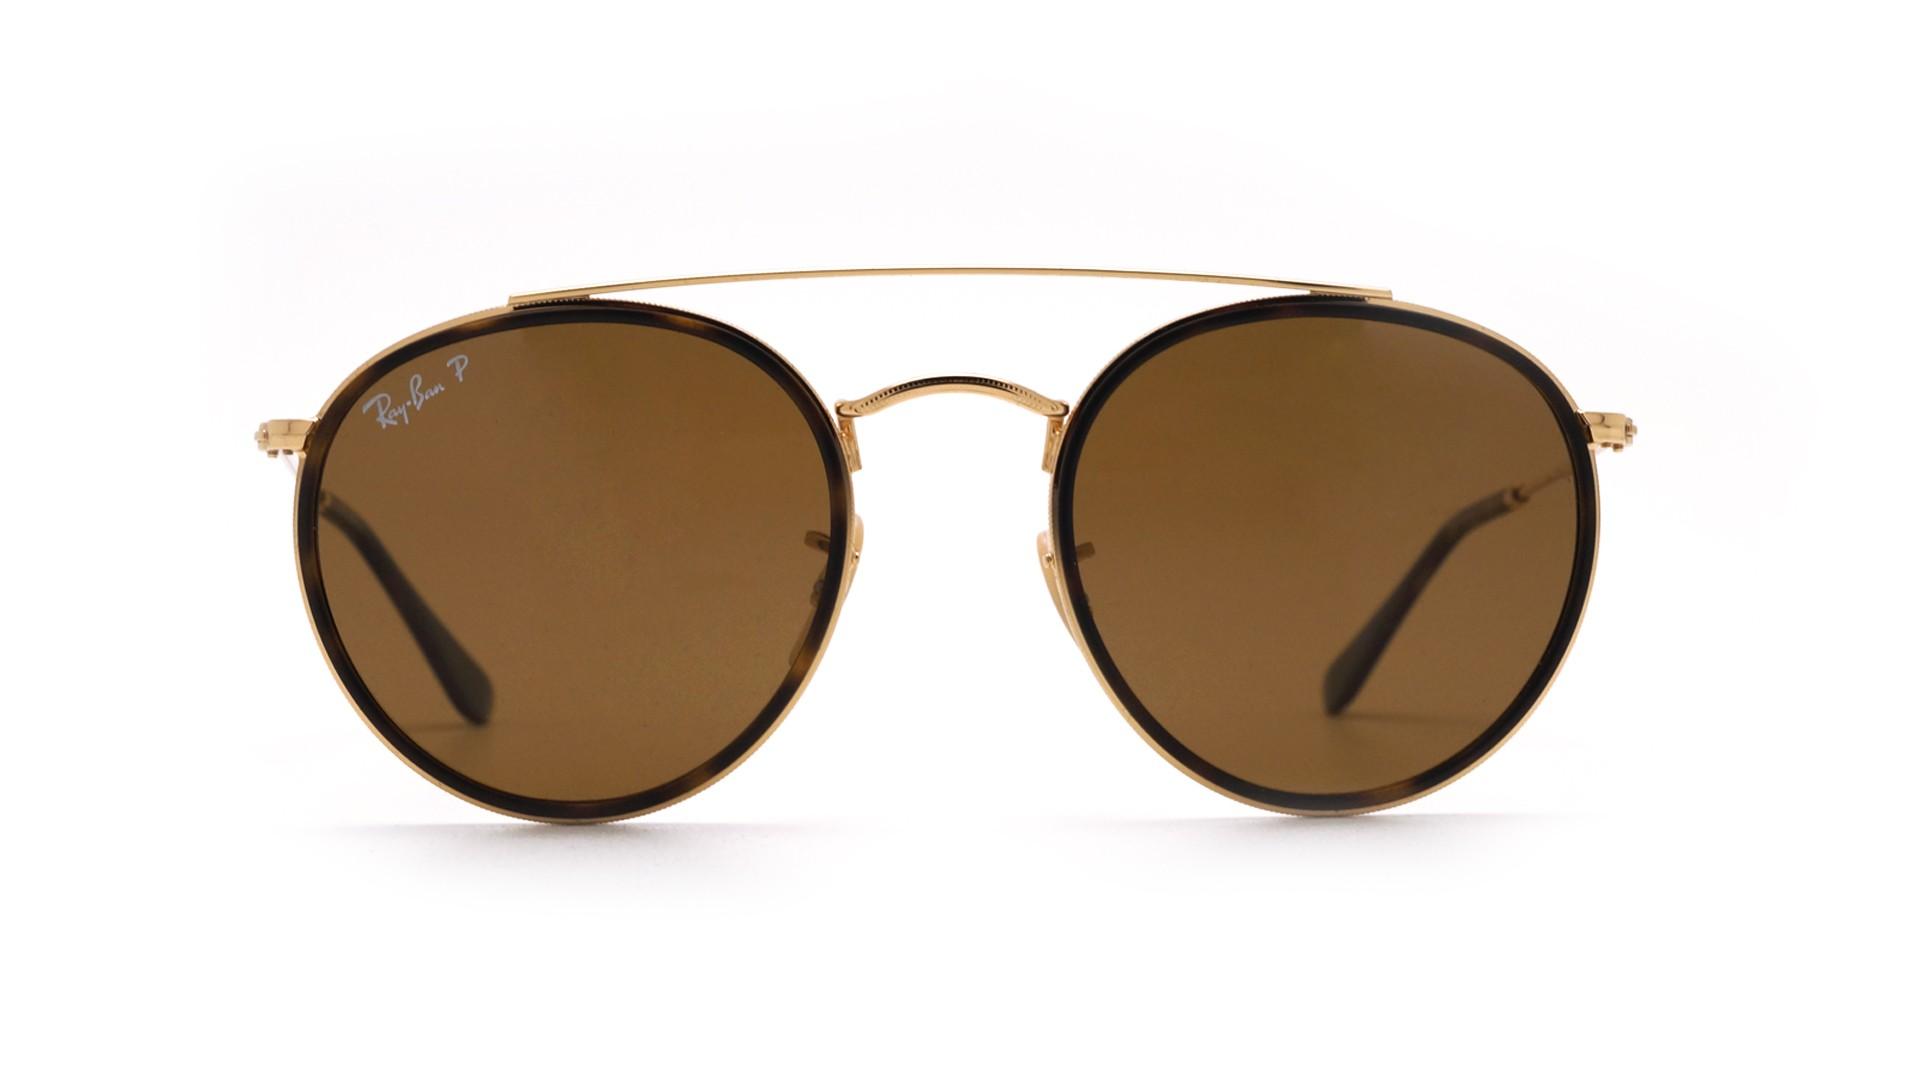 8a94dd8844b Sunglasses Ray-Ban Round Double Bridge Gold RB3647N 001 57 51-22 Medium  Polarized